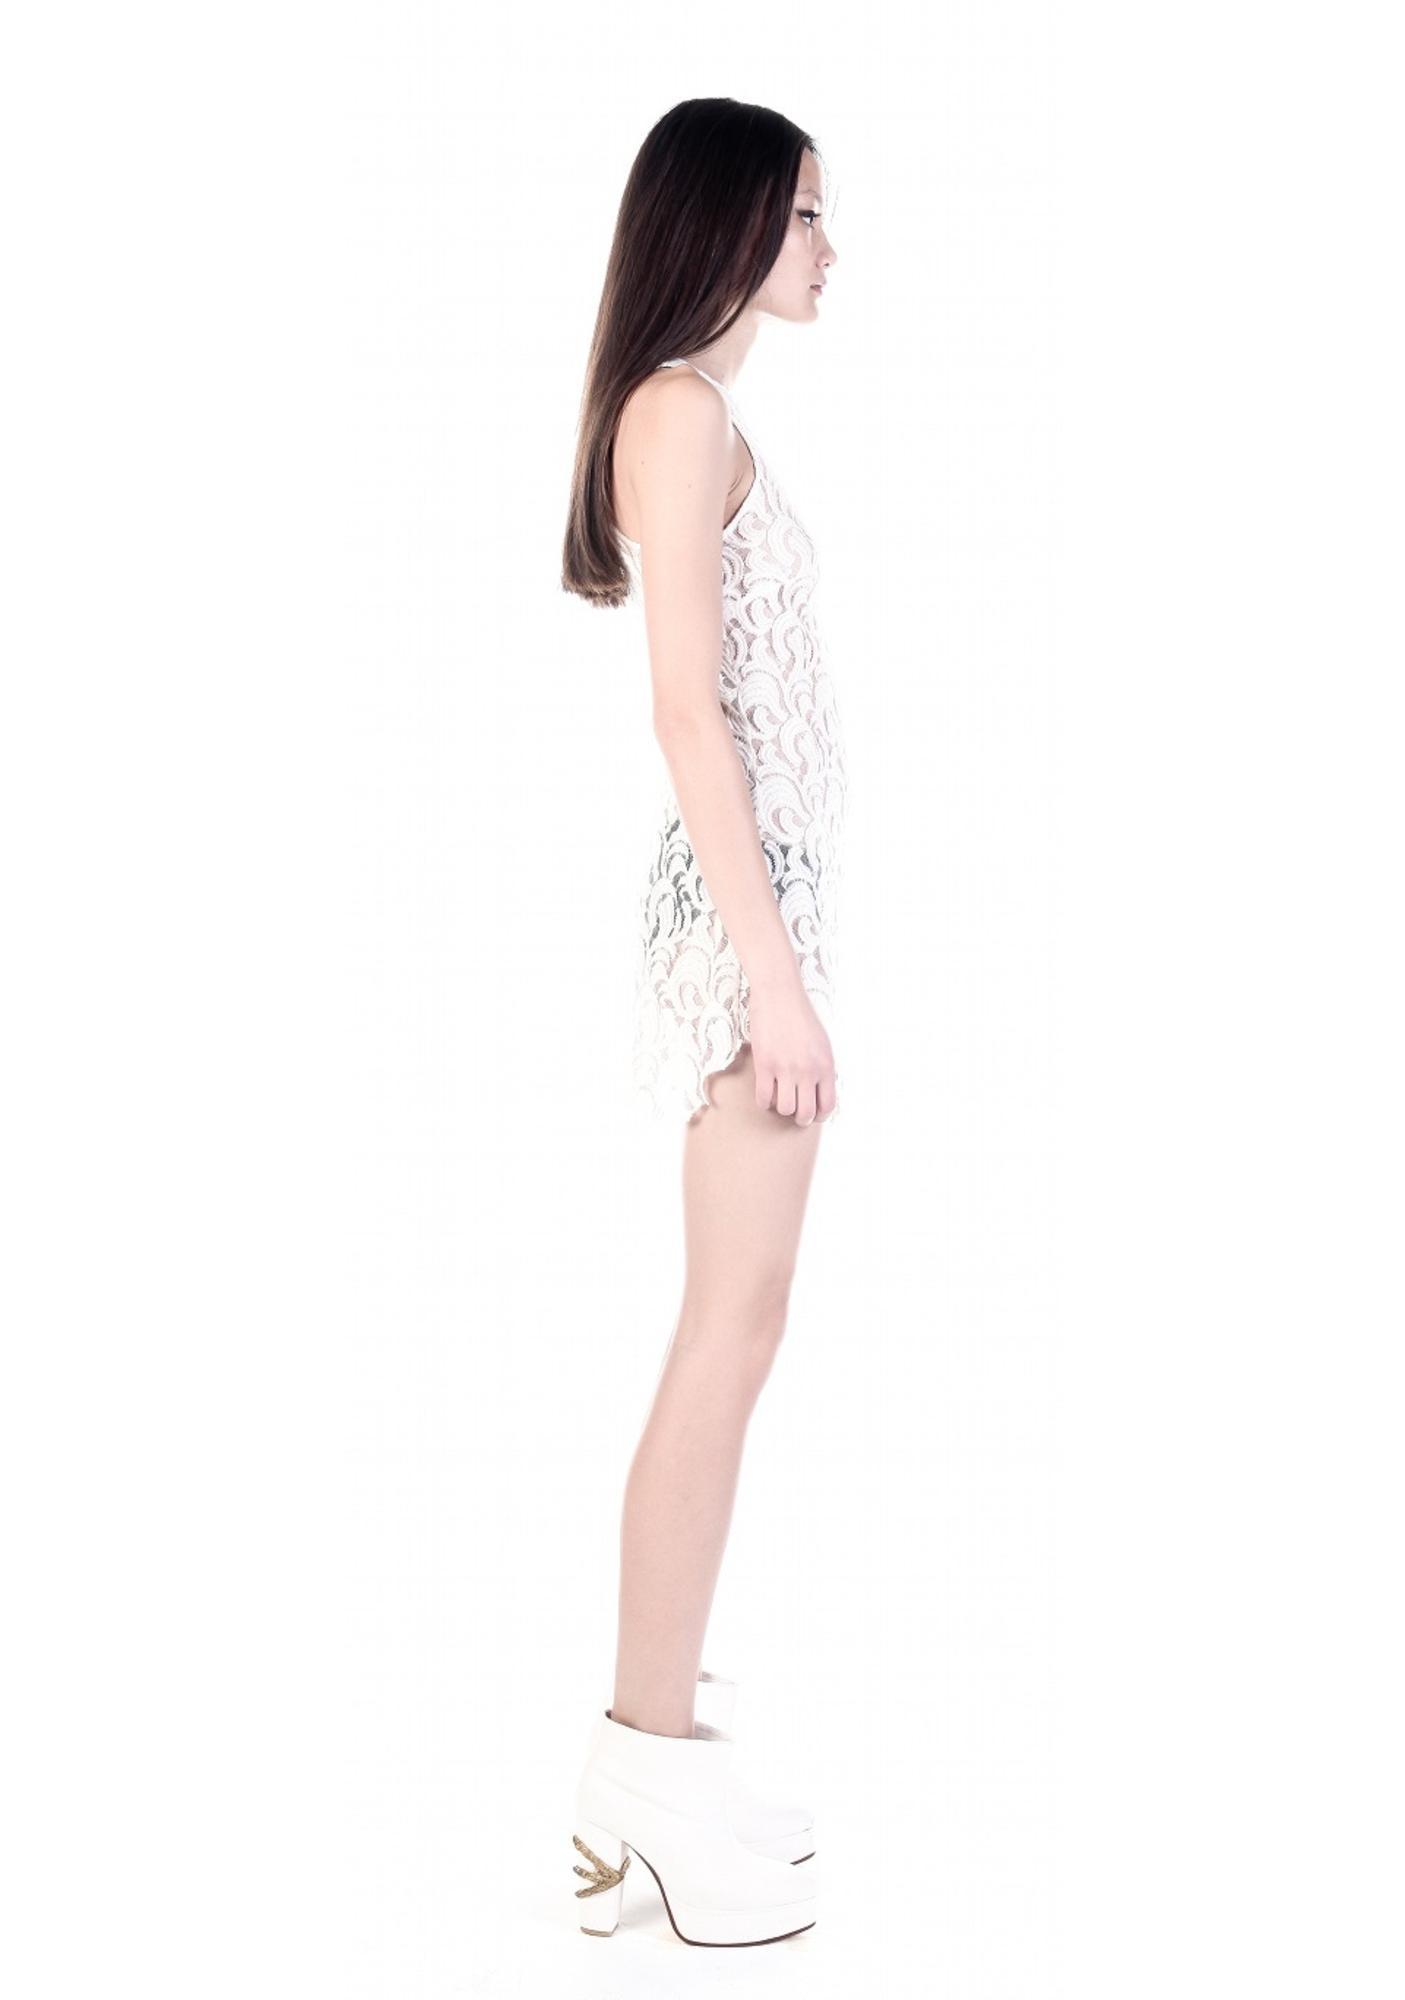 Friend Of Mine Verushka dress